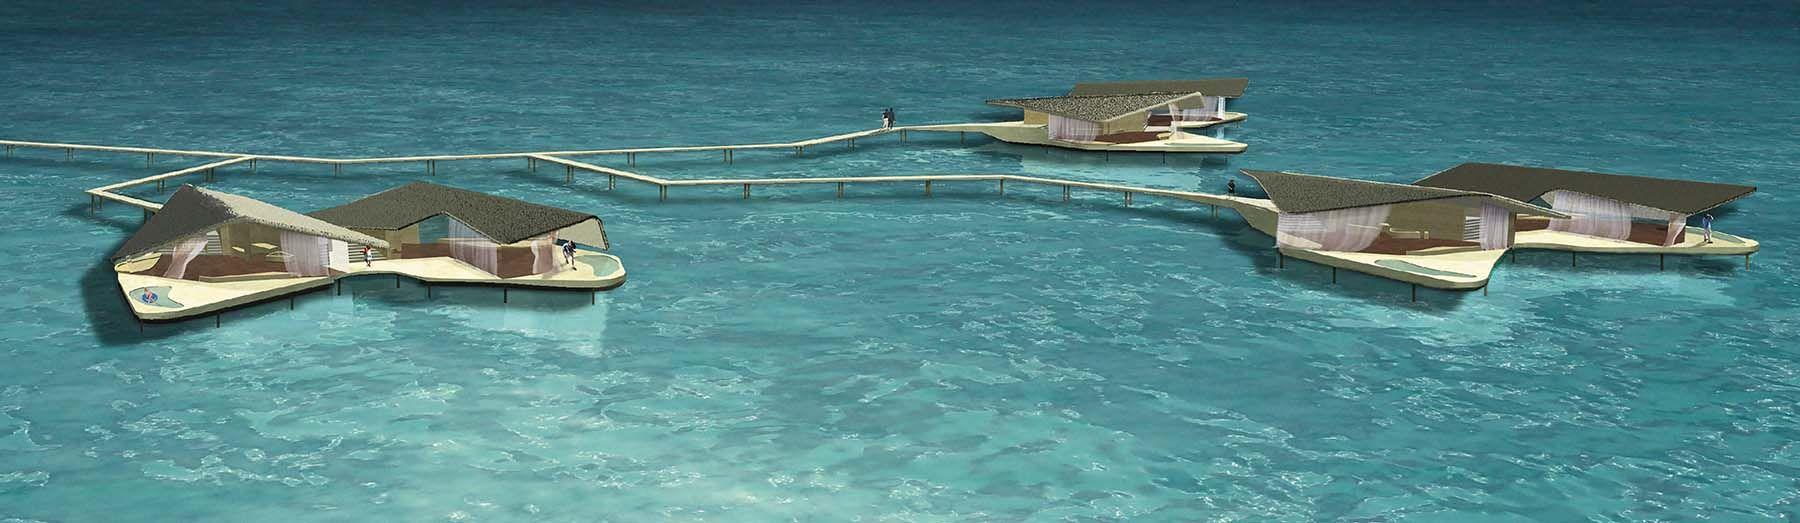 Water Cay Luxury Hotel Resort